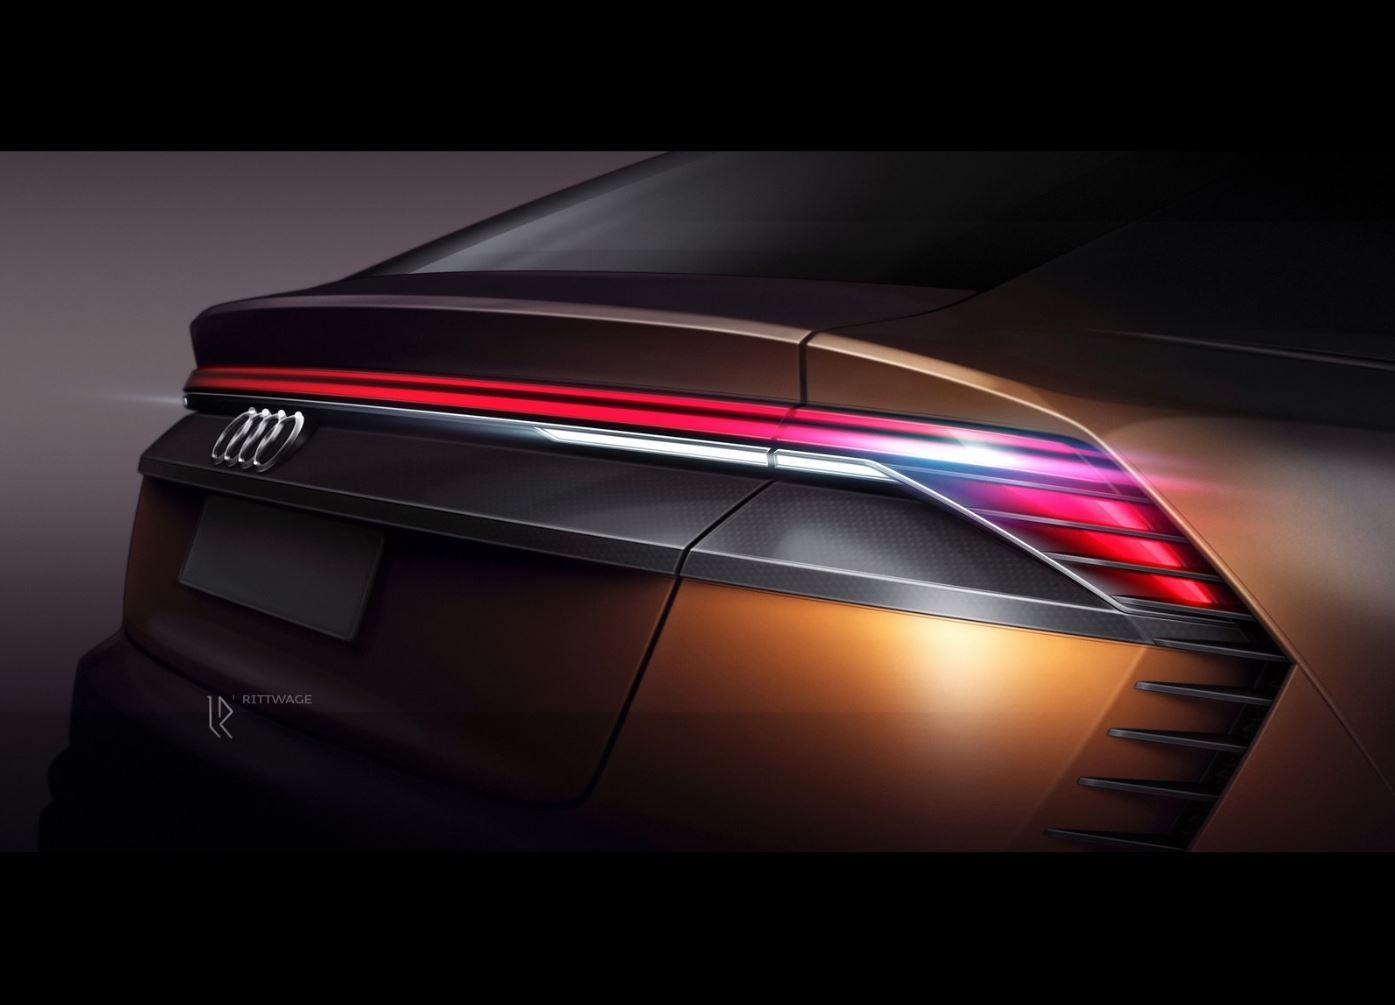 2017 Audi Q8 Sport Concept Rear Combi Lamp